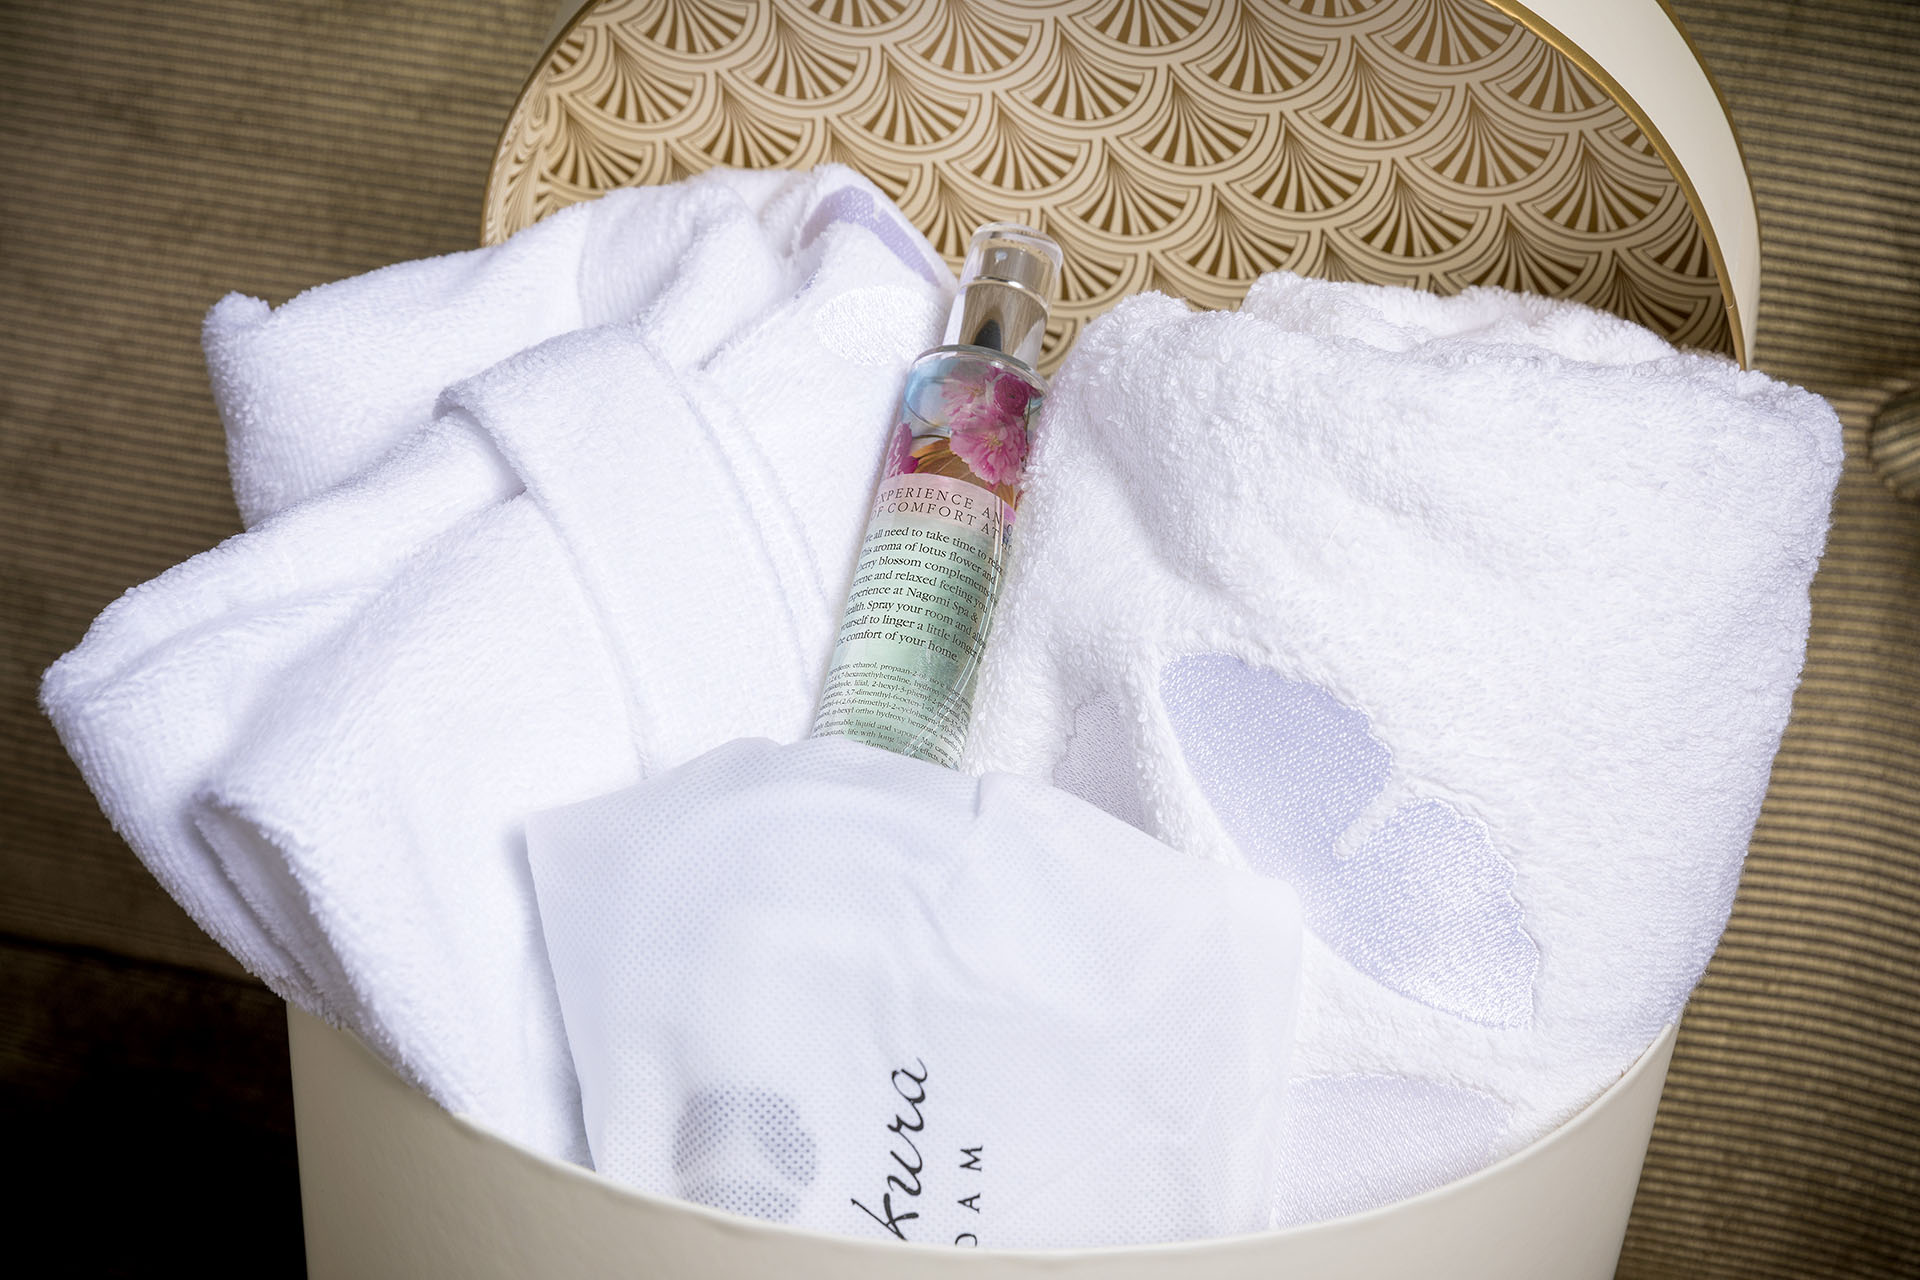 Hotel Okura Amsterdam - Okura's Boutique - Gift box bathrobe, towel, slippers and room spray